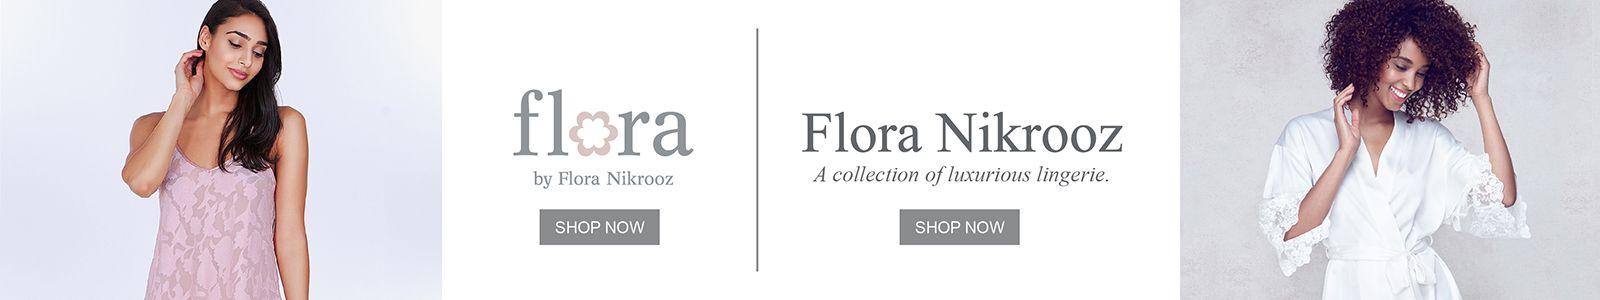 Flora by Flora N Krooz, Shop Now, Flora Nikrooz, a collection of luxurious lingerie, Shop Now